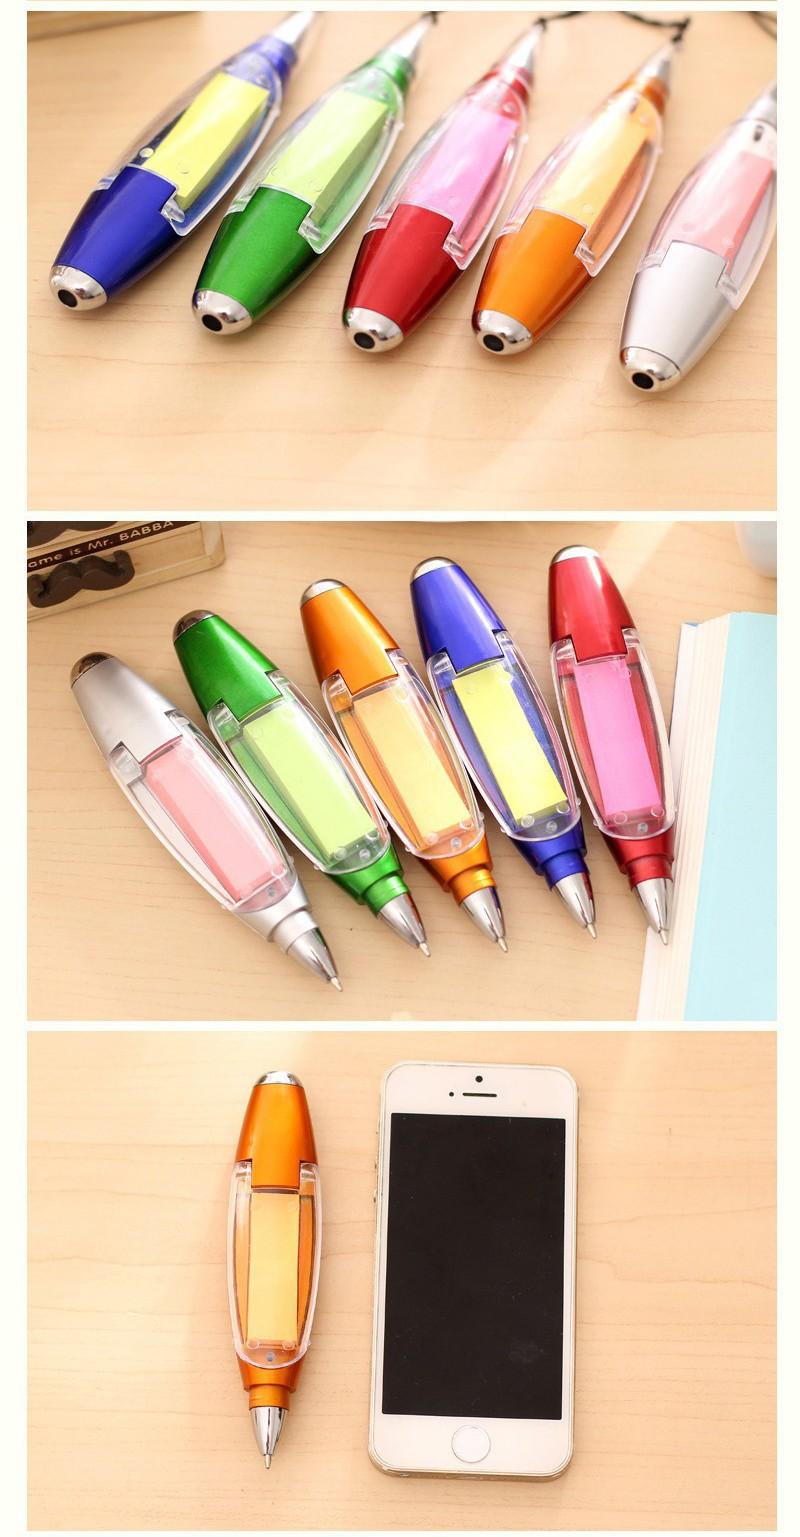 Ручка блокнот с фонариком ручка шпаргалка с бумагой внутри 08 - Ручка-блокнот с фонариком, ручка-шпаргалка с бумагой внутри